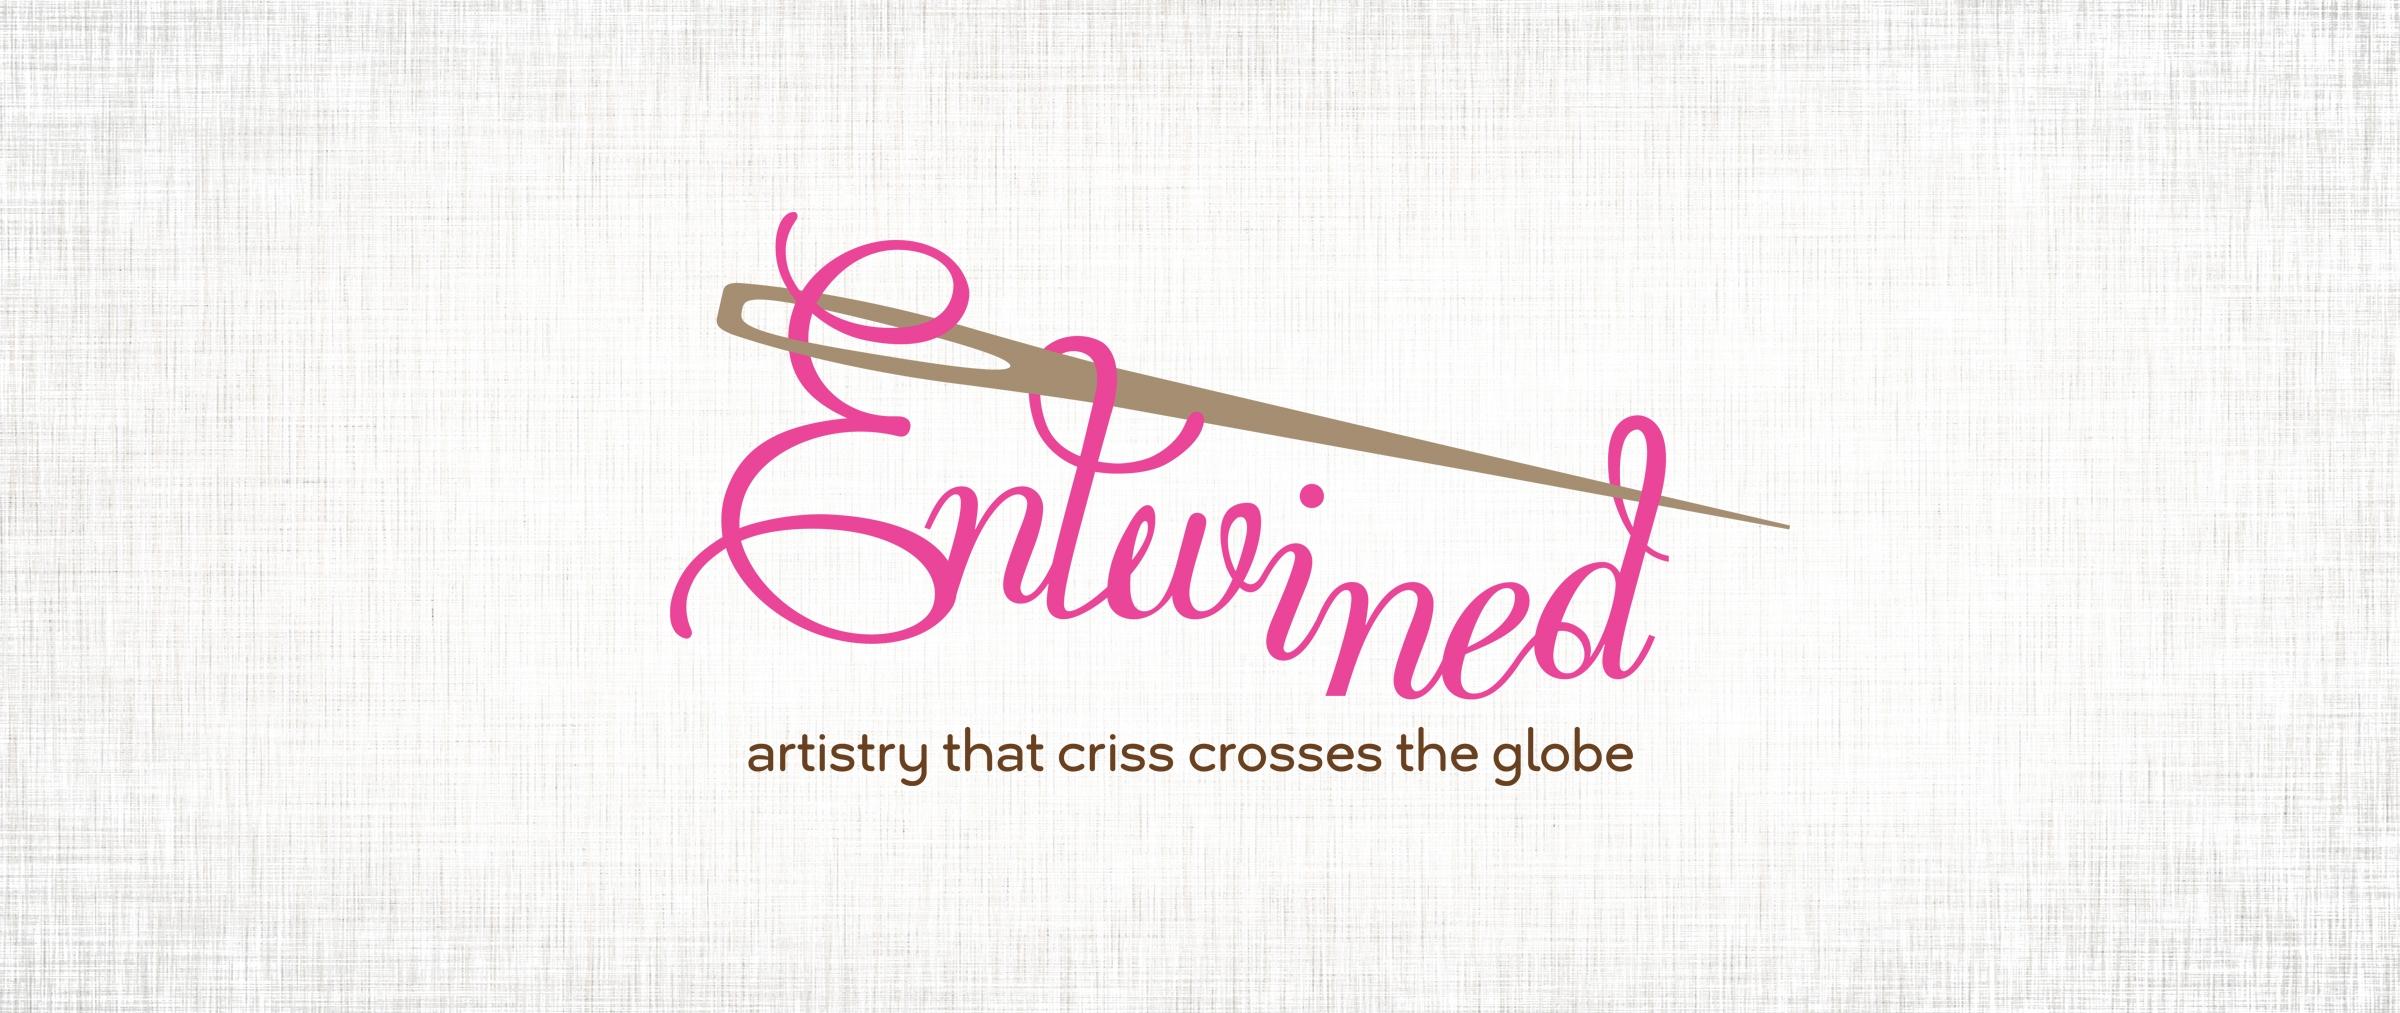 enzed_2016website_branding_entwined1r